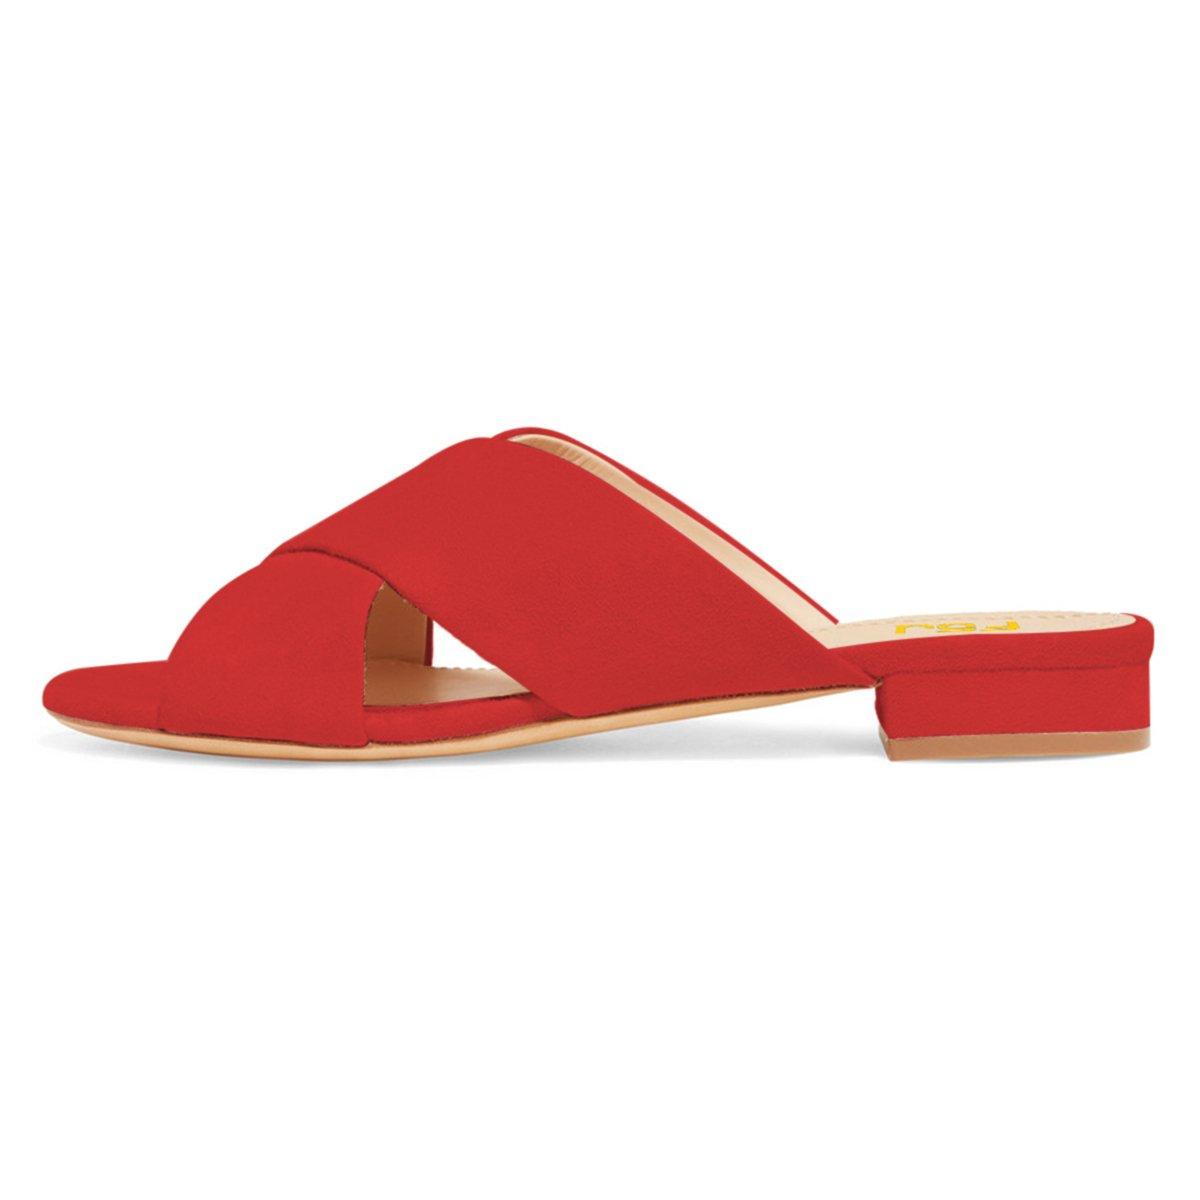 FSJ Women Comfortable Cross Strap Sandals Low Heels Mules Slide Casual Flats Shoes Size 4-15 US B07CTG7HHQ 12 B(M) US|Red